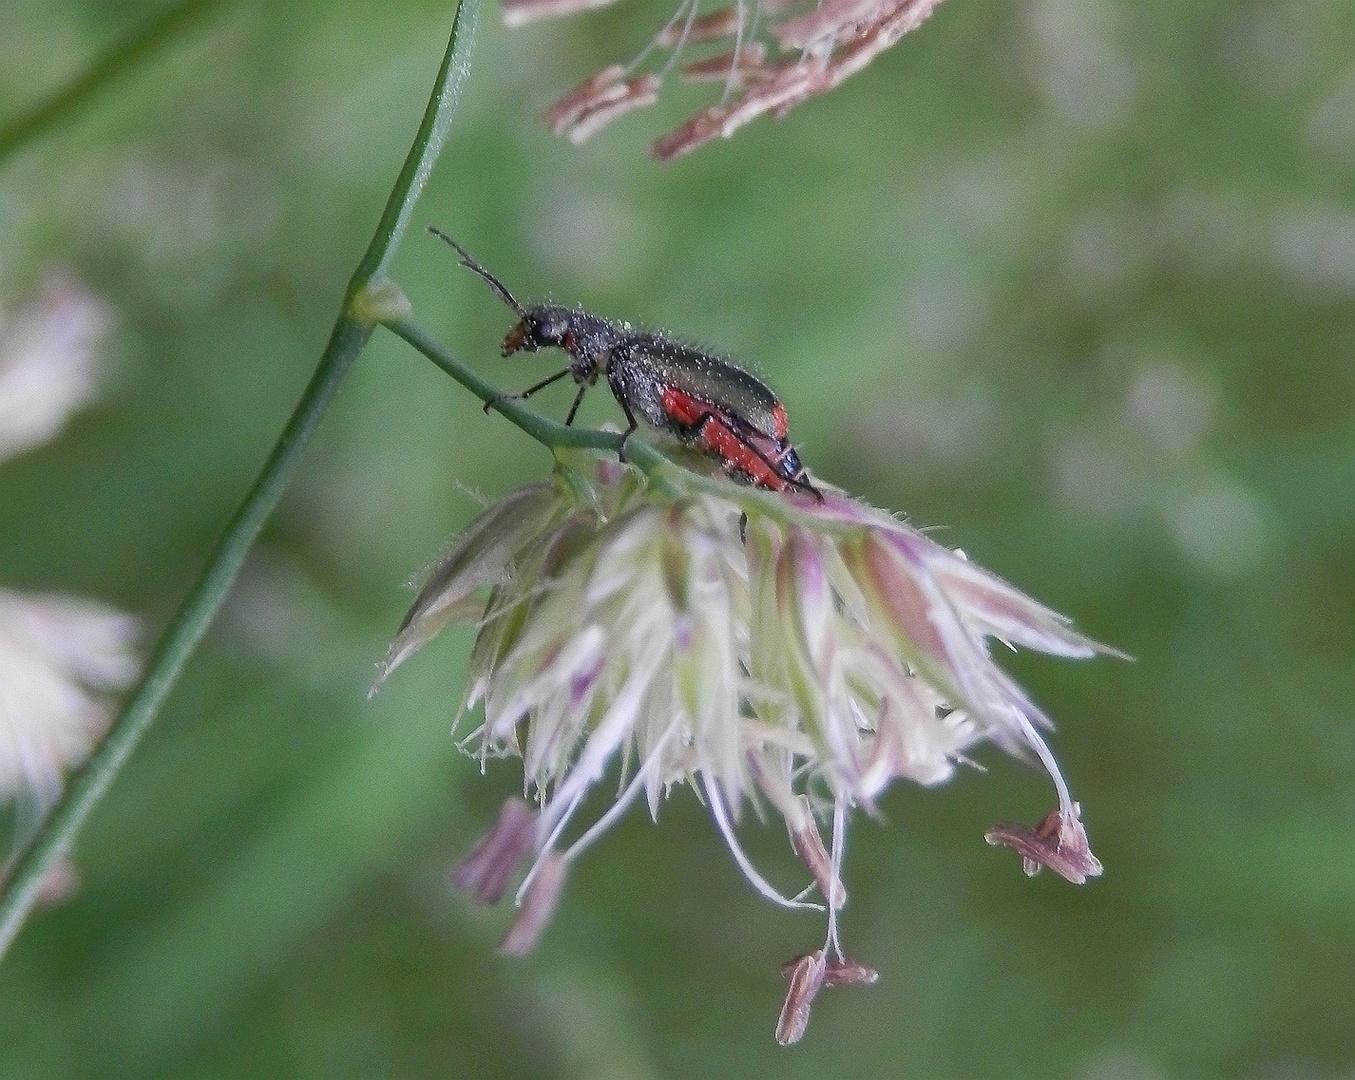 Zweifleckiger Malachitkäfer (Malachius bipustulatus) auf blühendem Gras